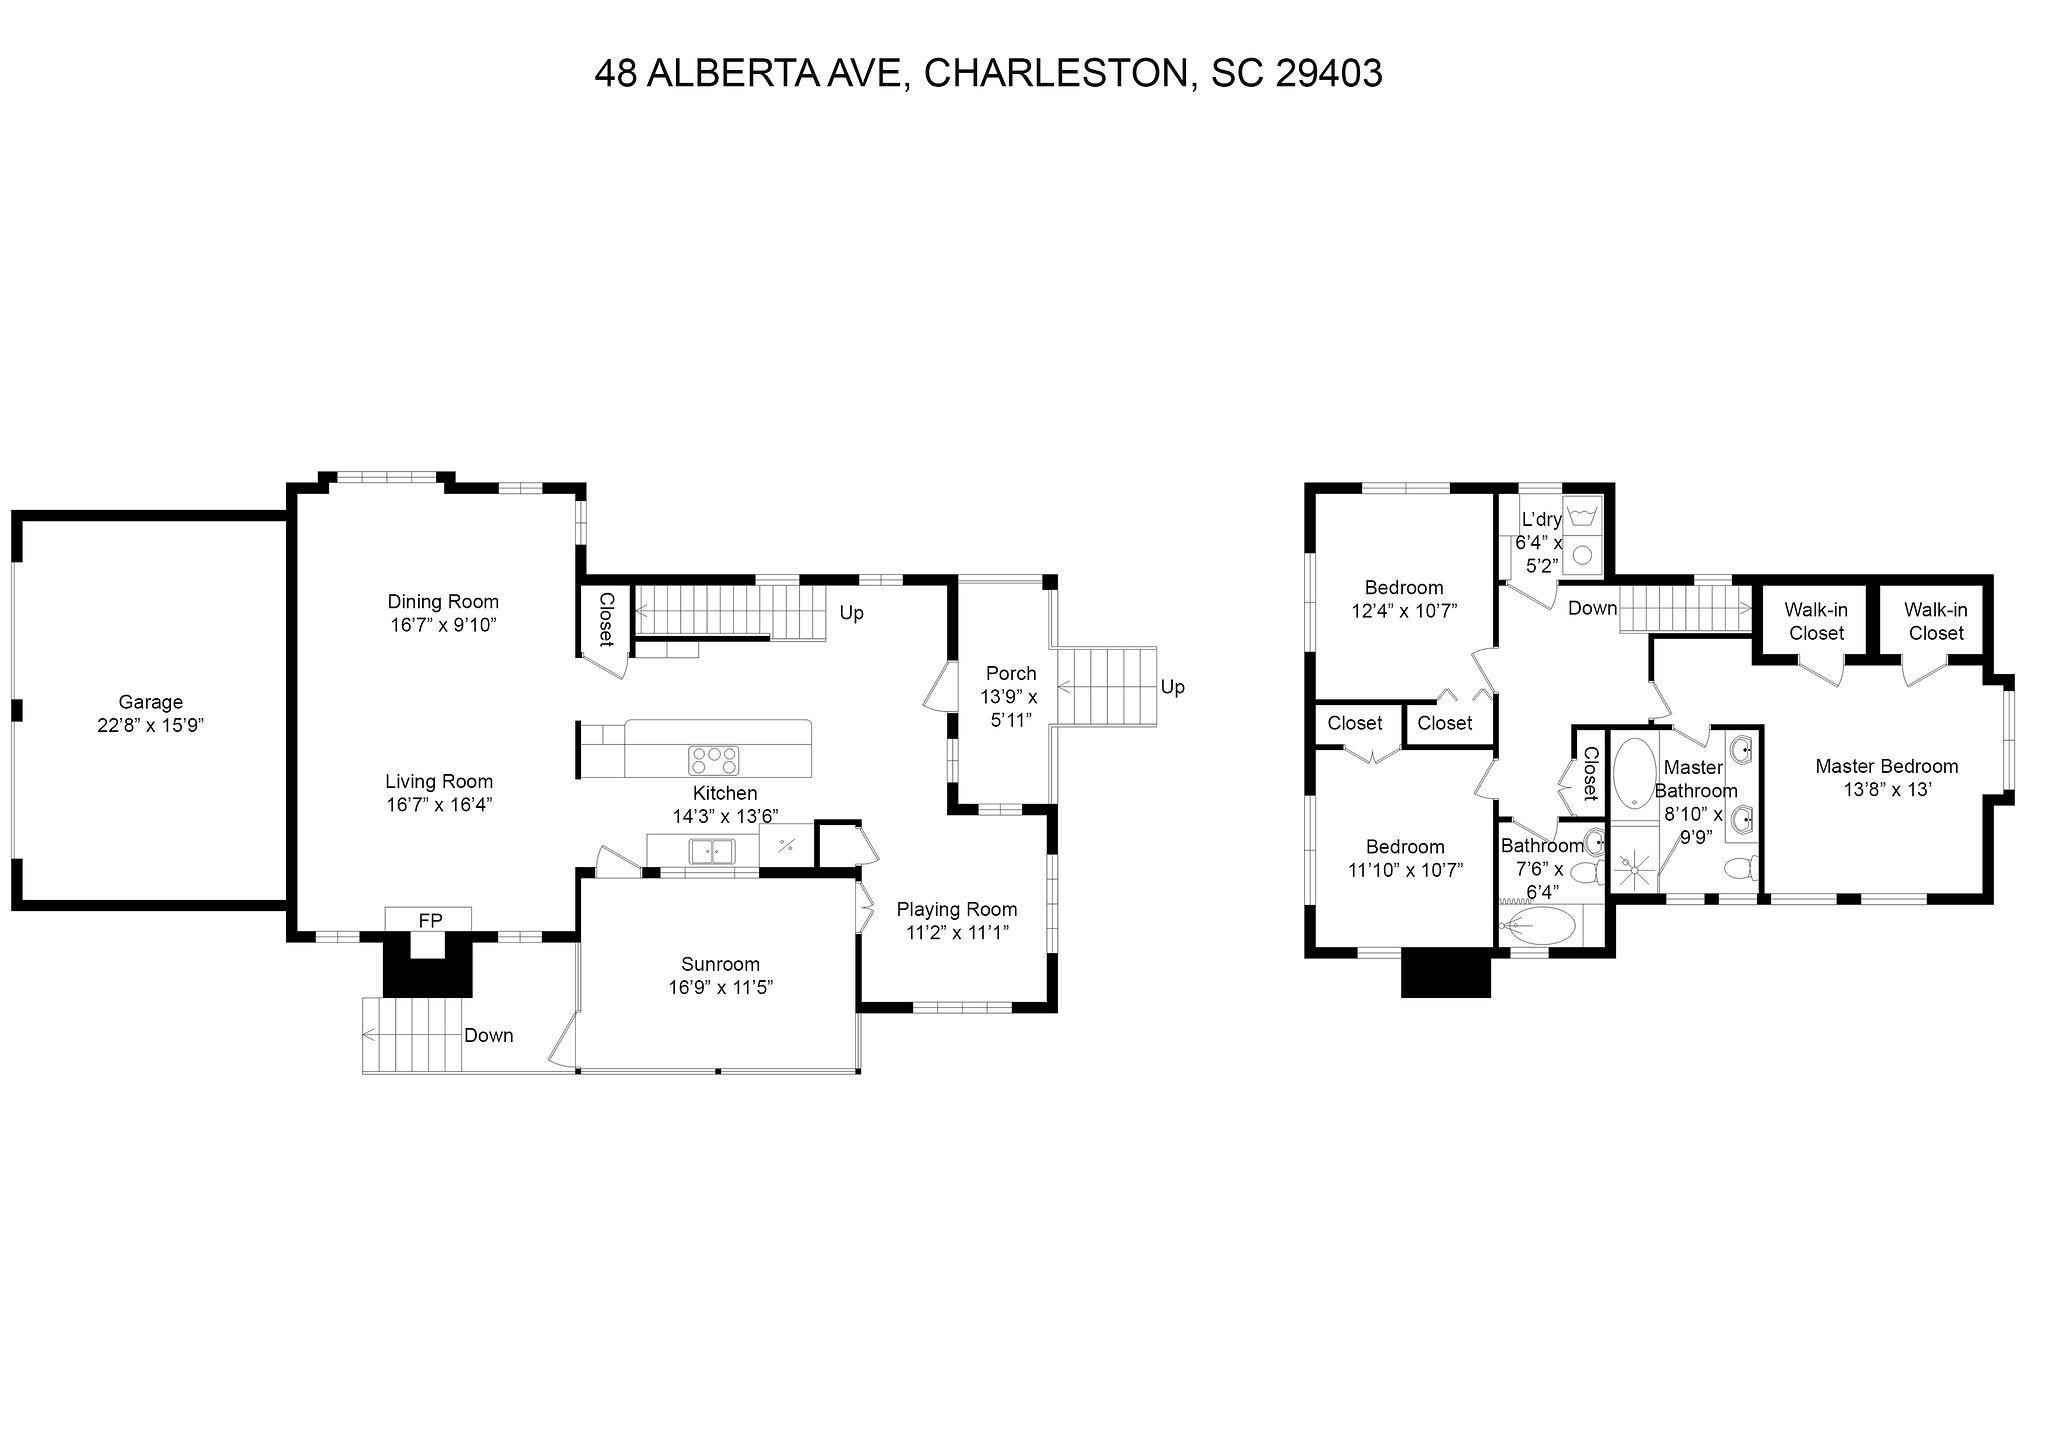 48 Alberta Avenue Charleston, SC 29403